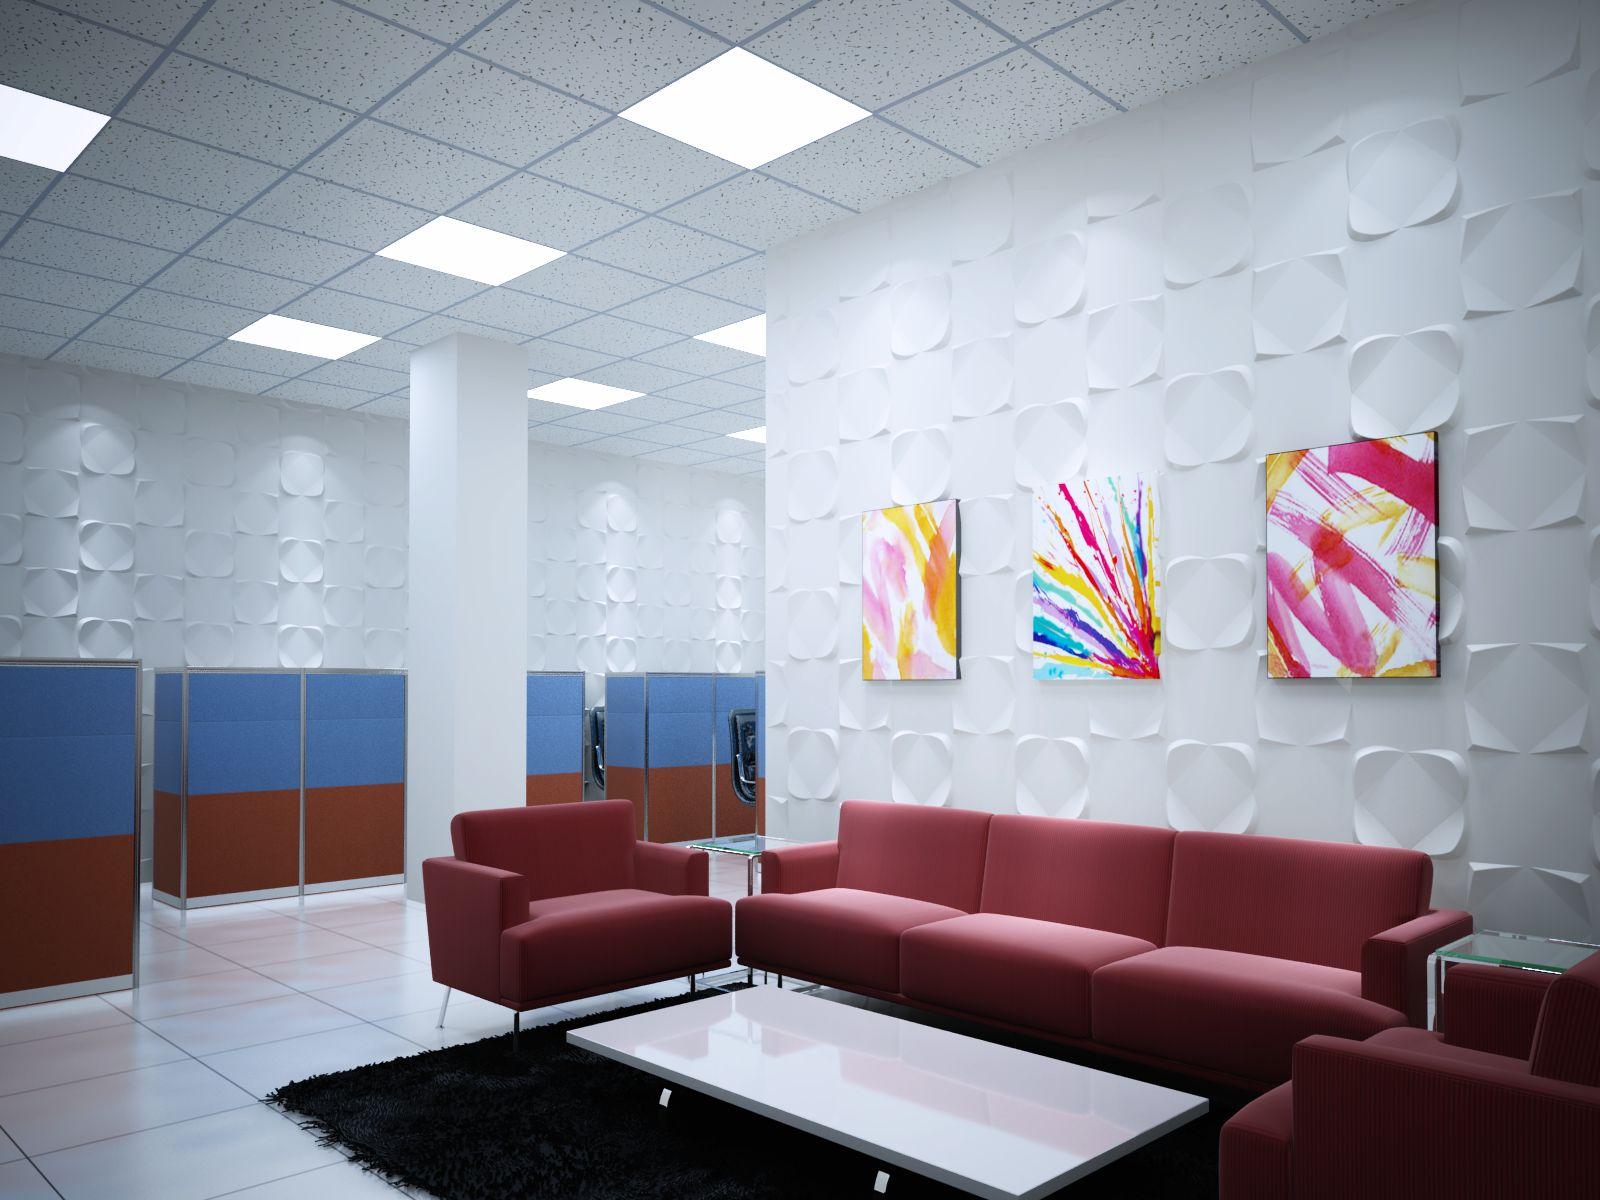 500*500mm Interor Decoration 3d Wall Panel Johor Bahru - Buy 3d Wall ...